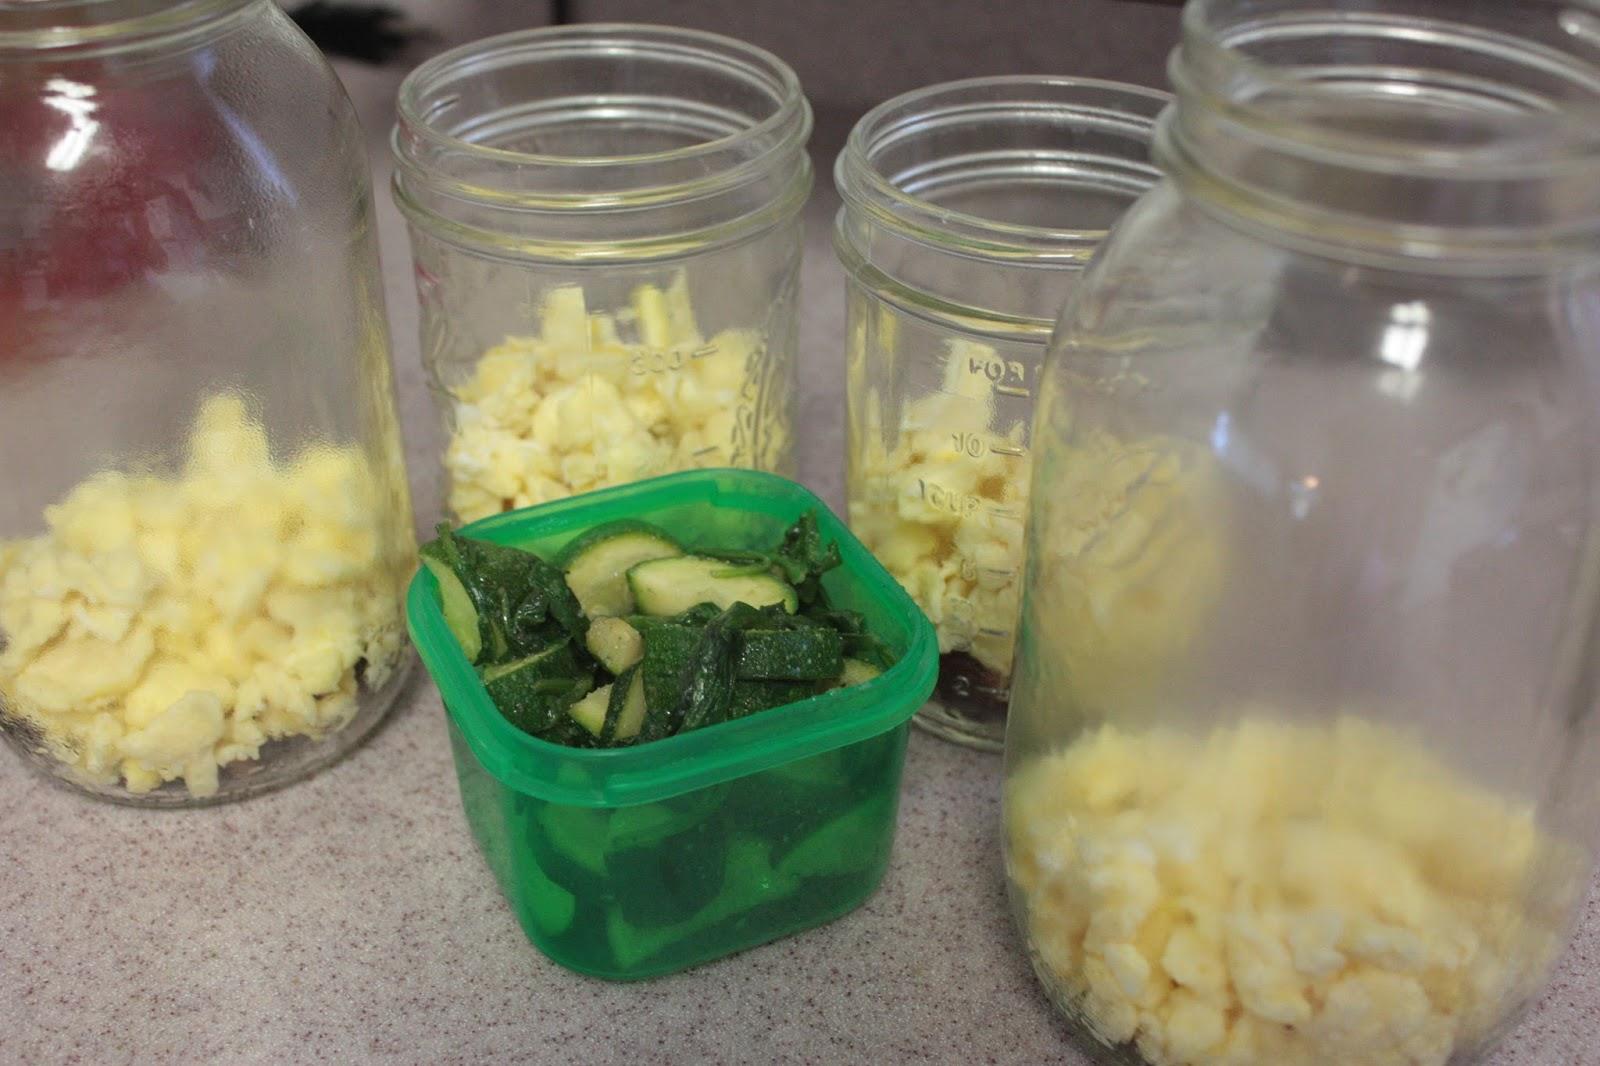 21 day fix approved breakfast jars scrambled eggs laura sosa. Black Bedroom Furniture Sets. Home Design Ideas